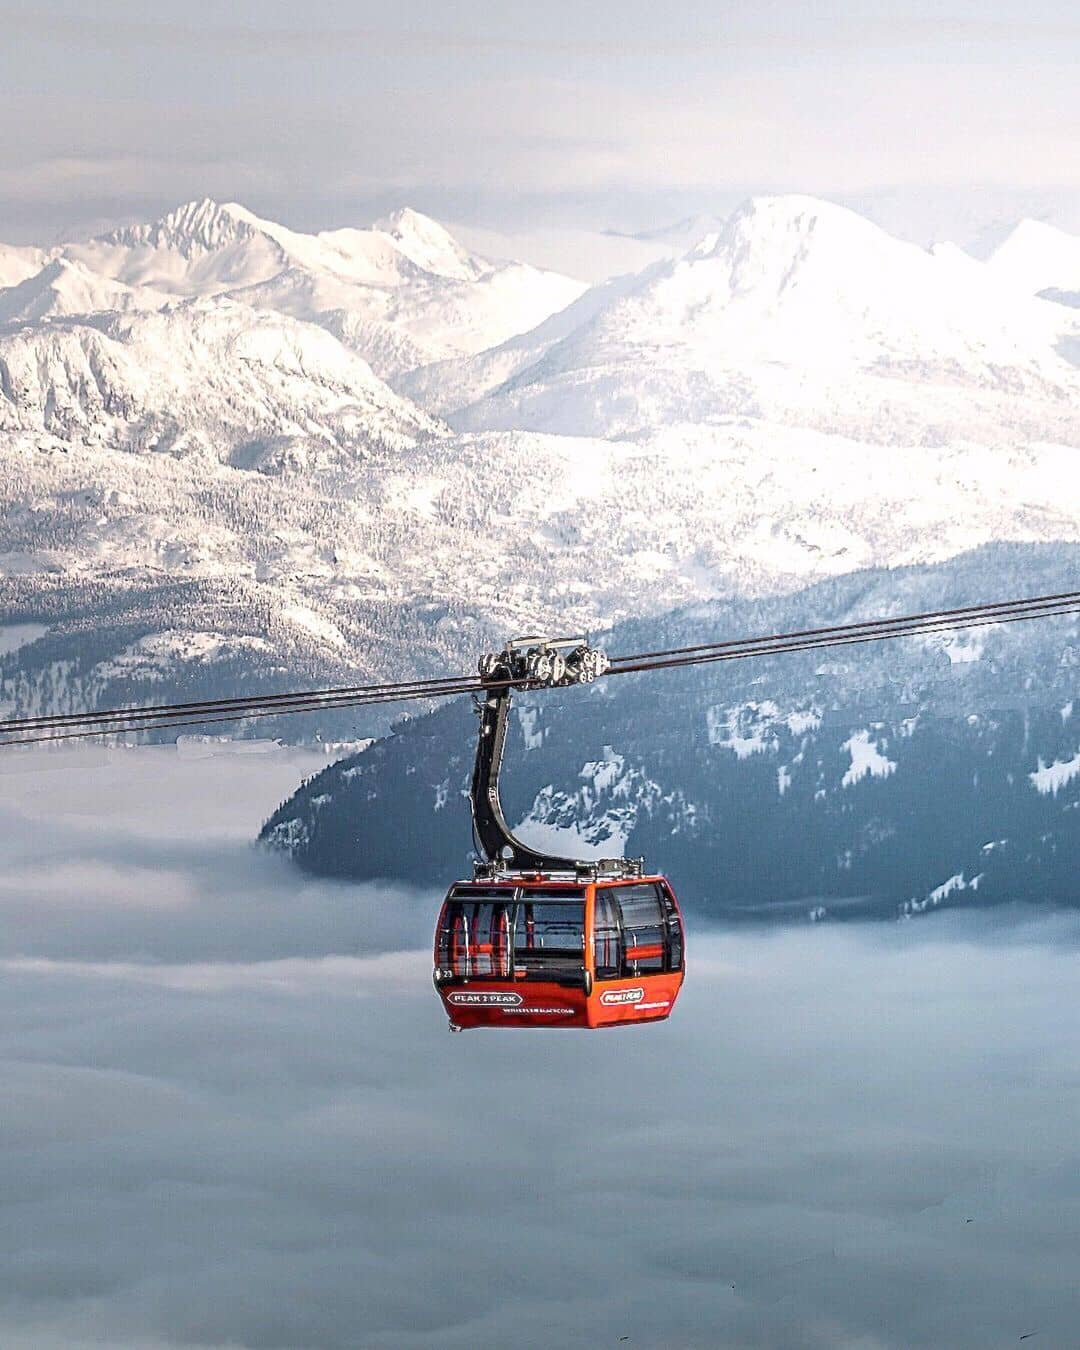 vancouver to whistler peak 2 peak @stevereekie @s.voldemorden